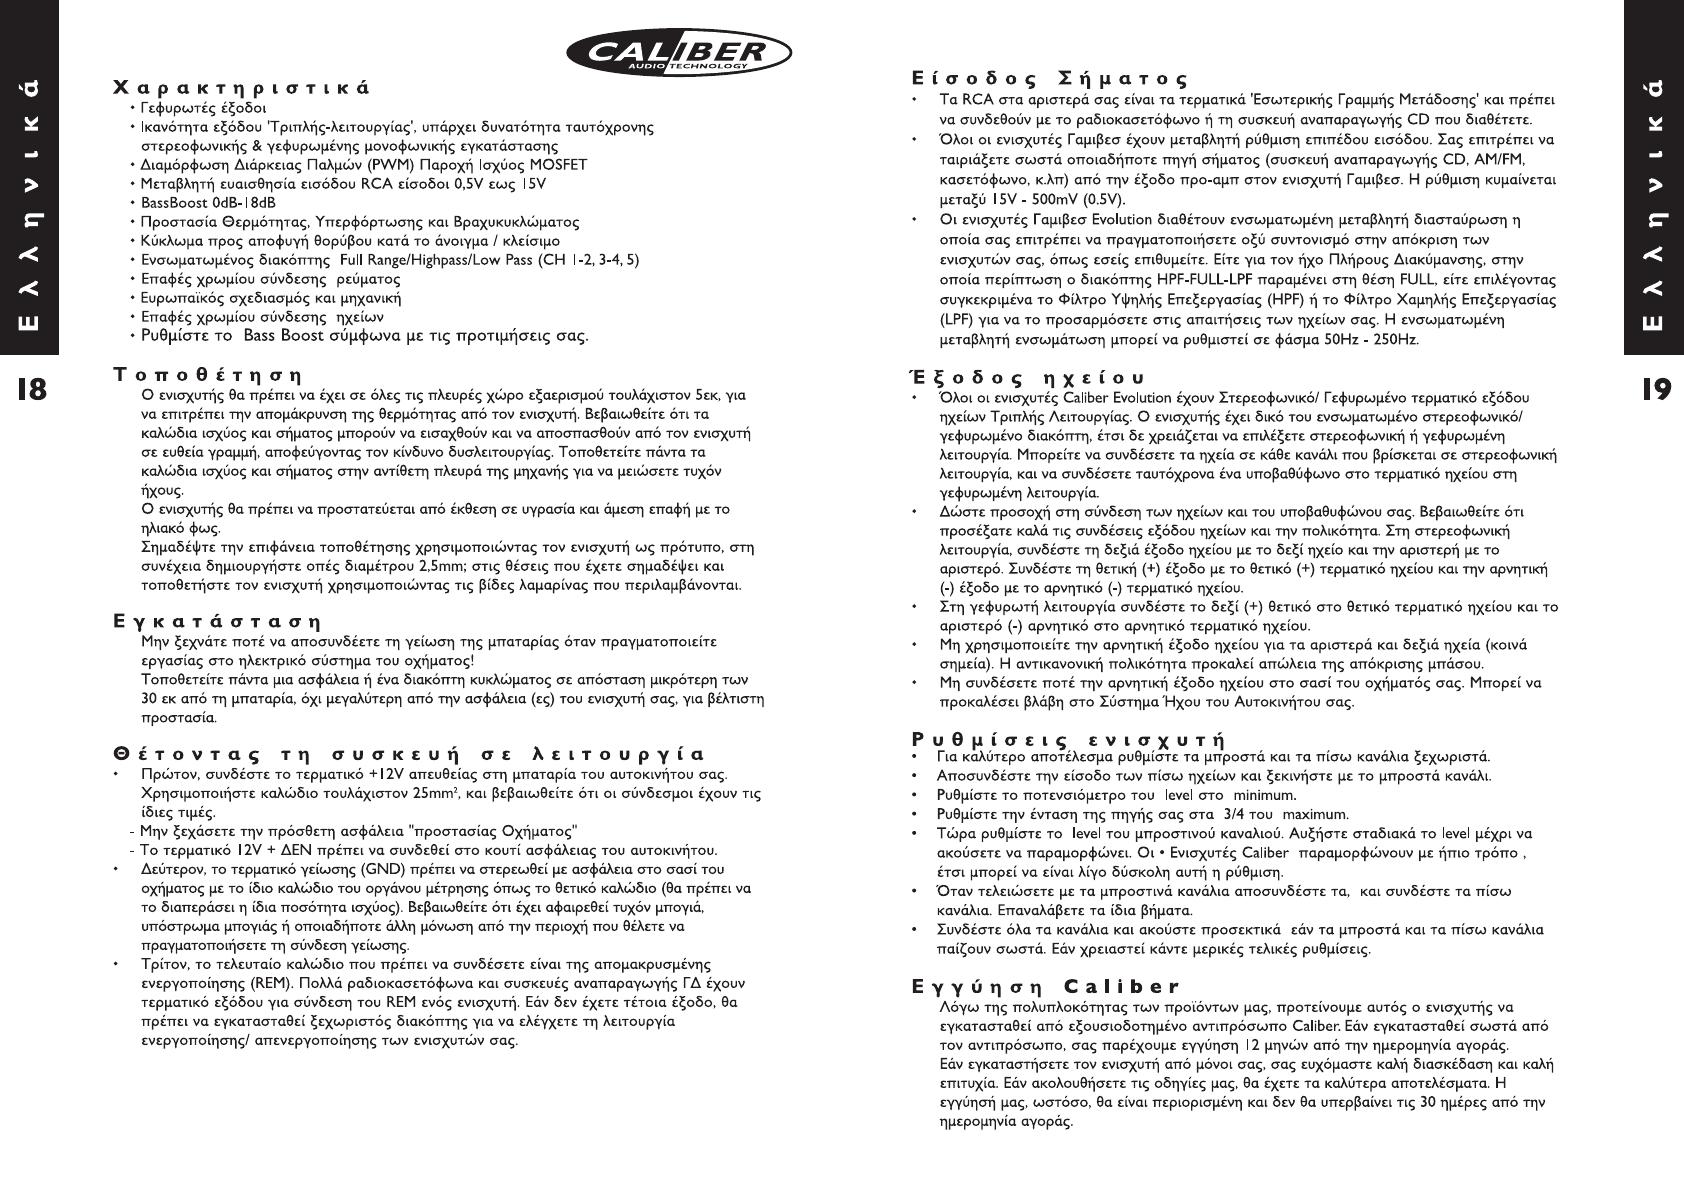 Handleiding Caliber ca 5360 (pagina 11 van 14) (Deutsch, English ...